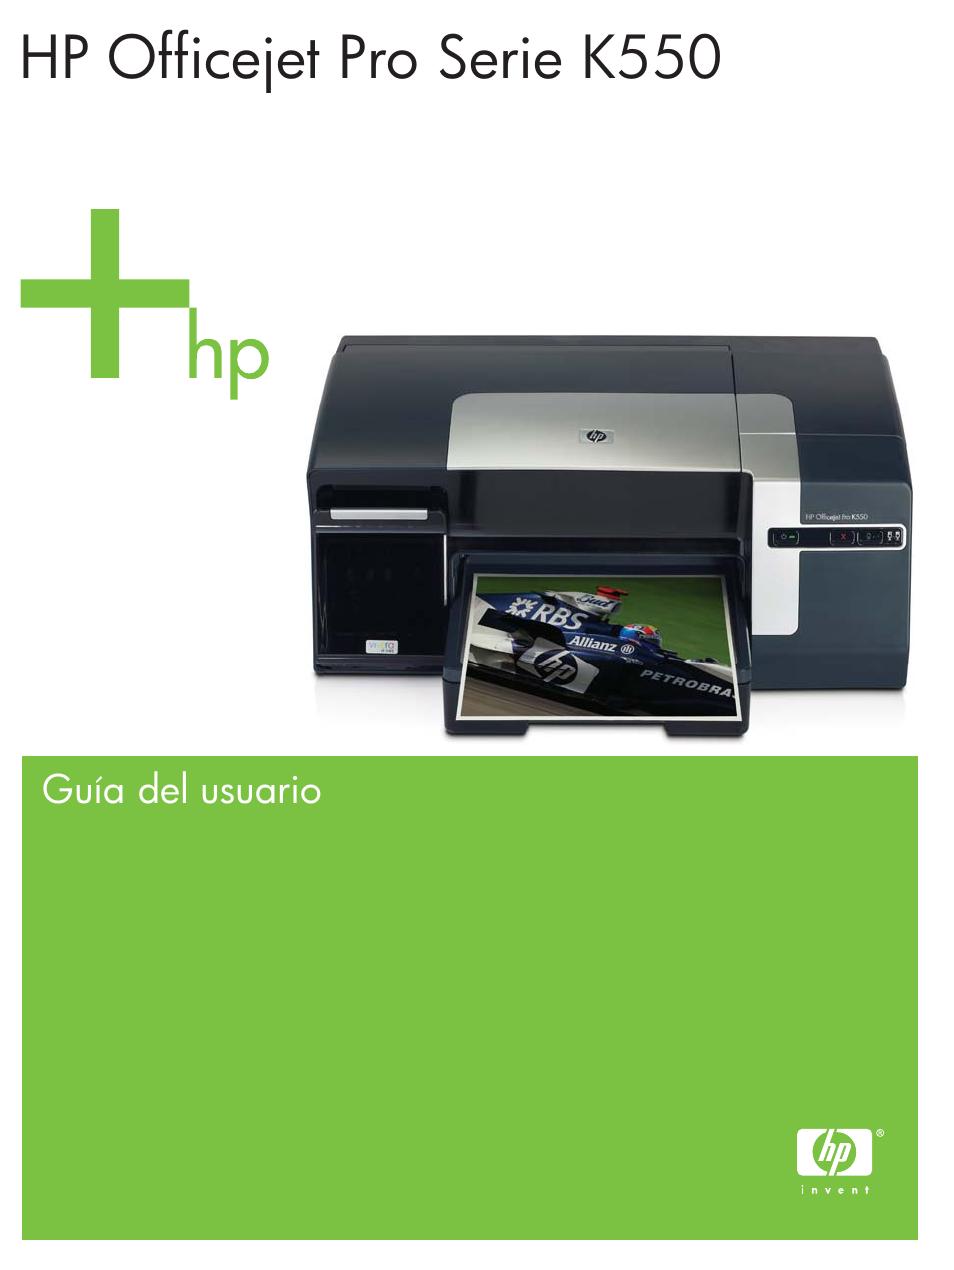 hp officejet pro k550 printer manual del usuario p ginas 148 rh pdfmanuales com